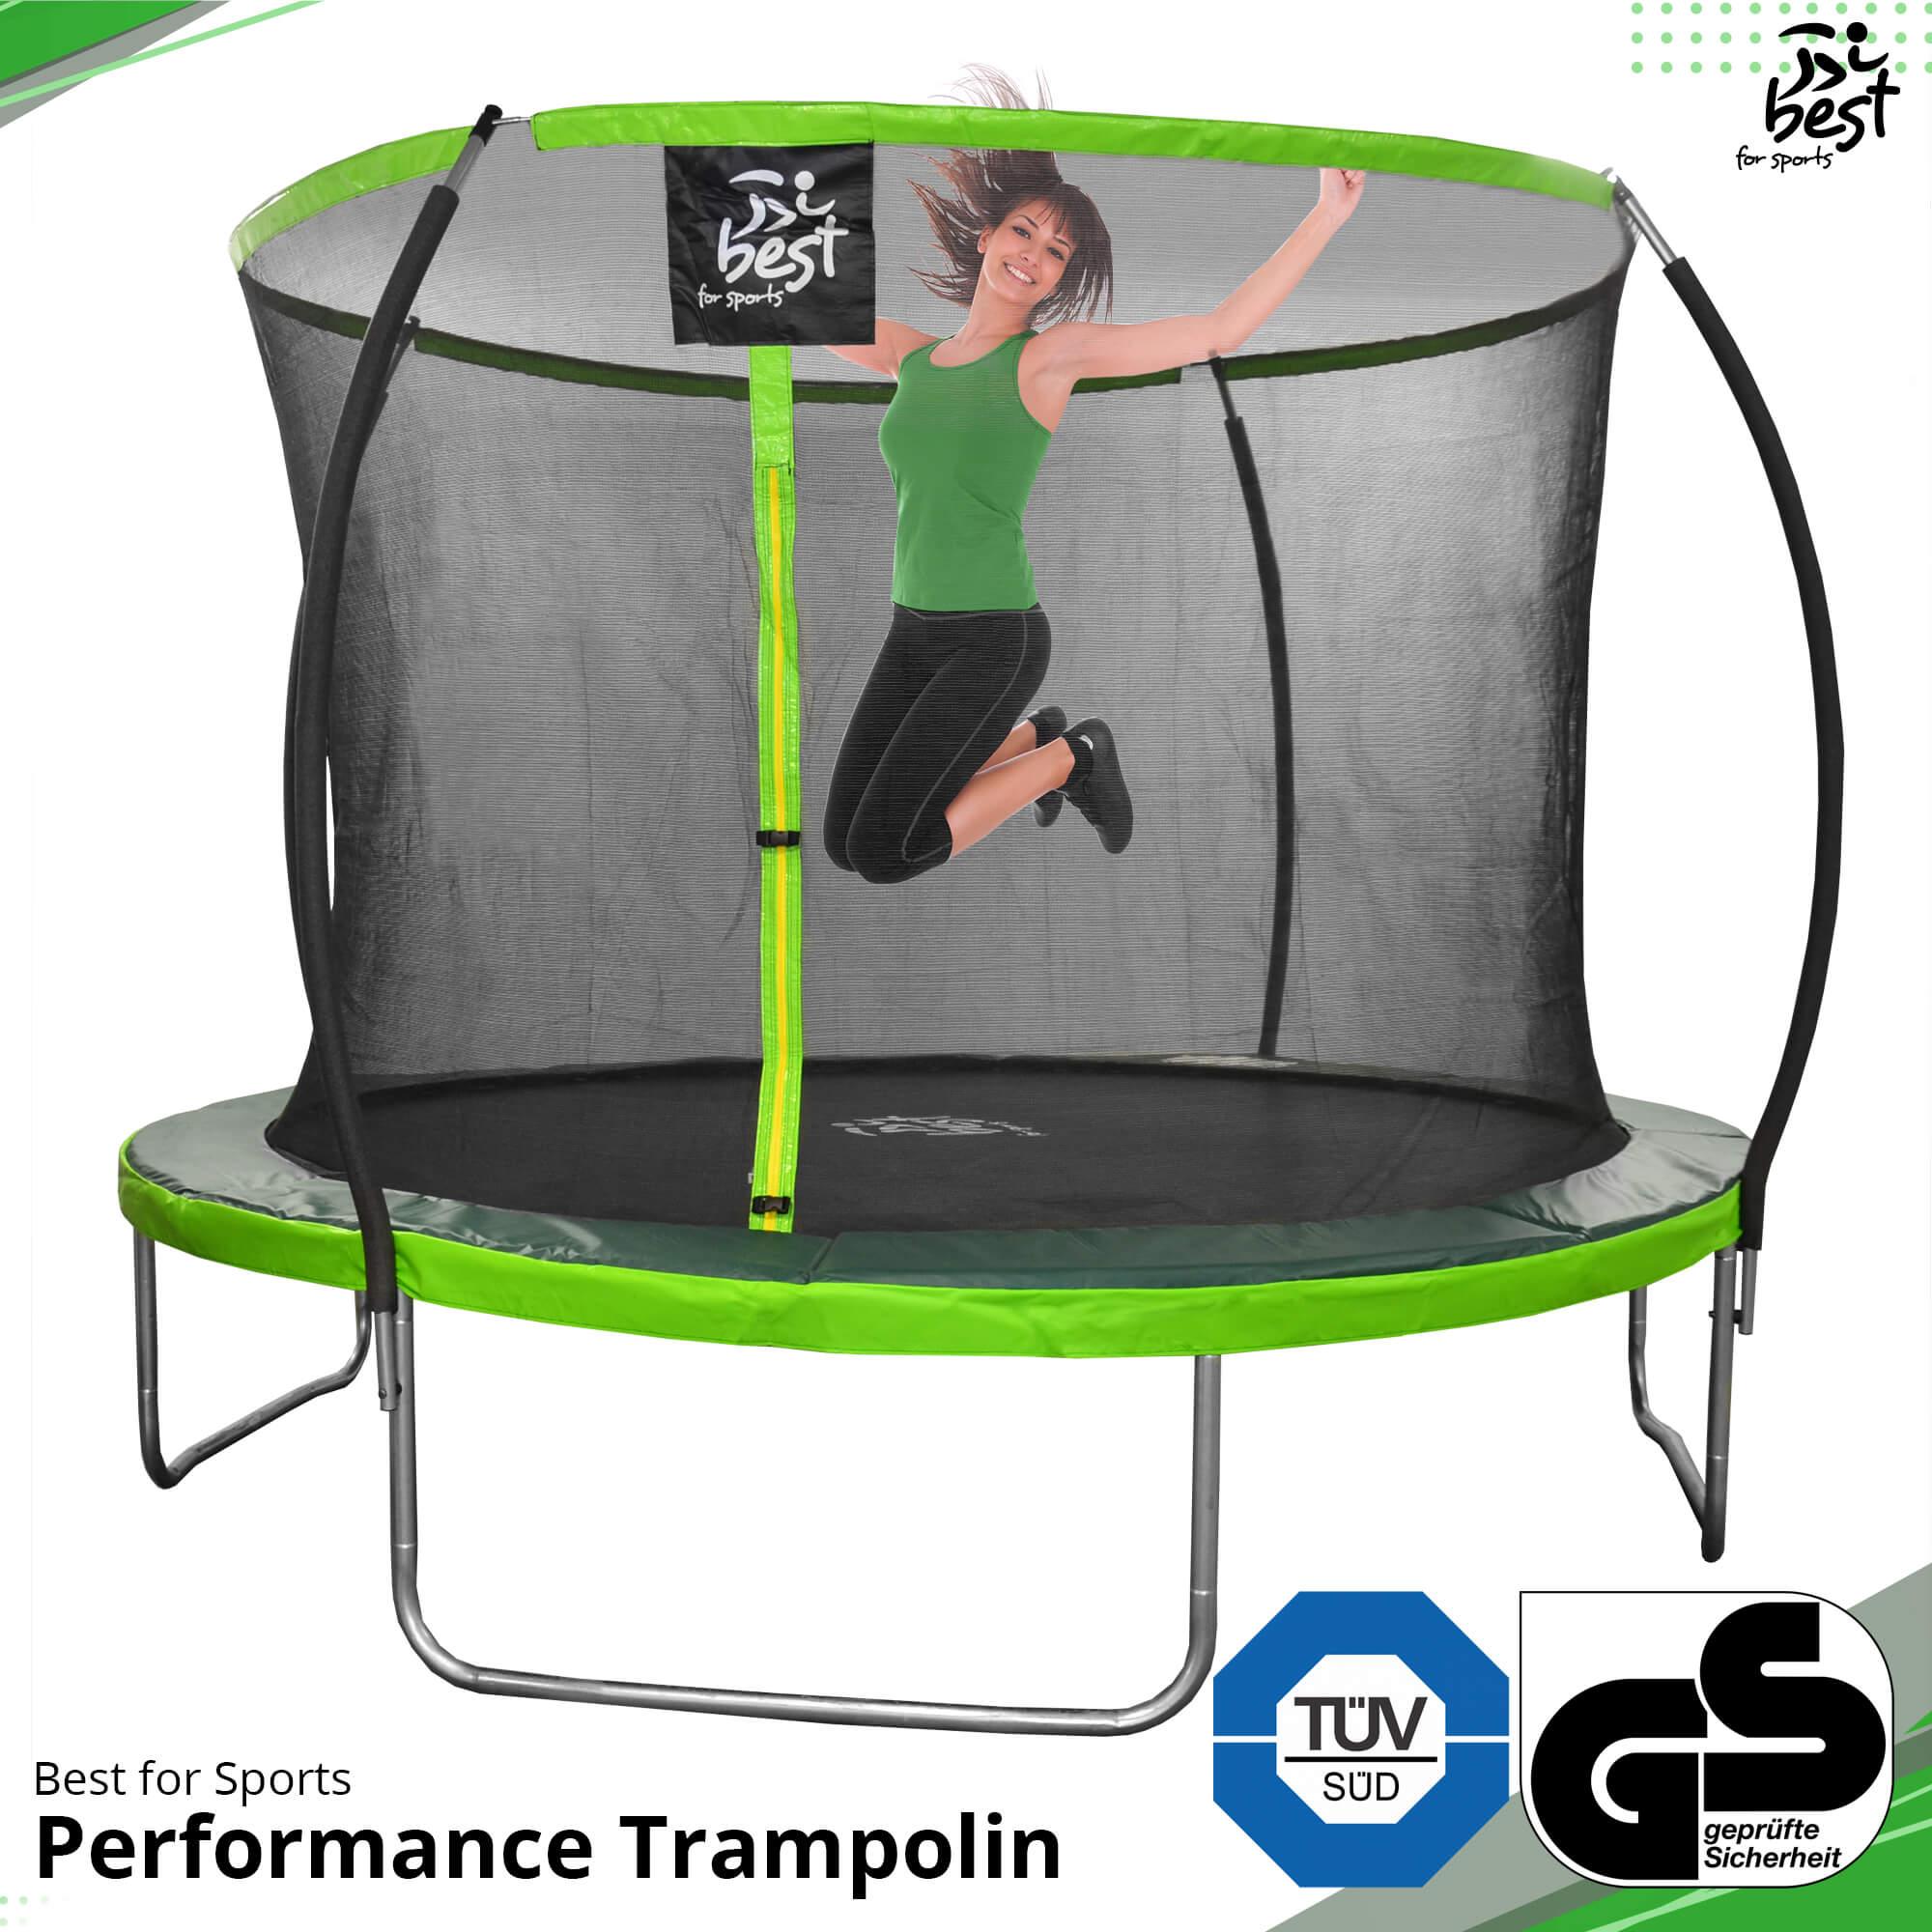 Trampolin Outdoor Gartentrampolin Komplettset Leiter 18 244 305 366 427 Cm Top Ebay